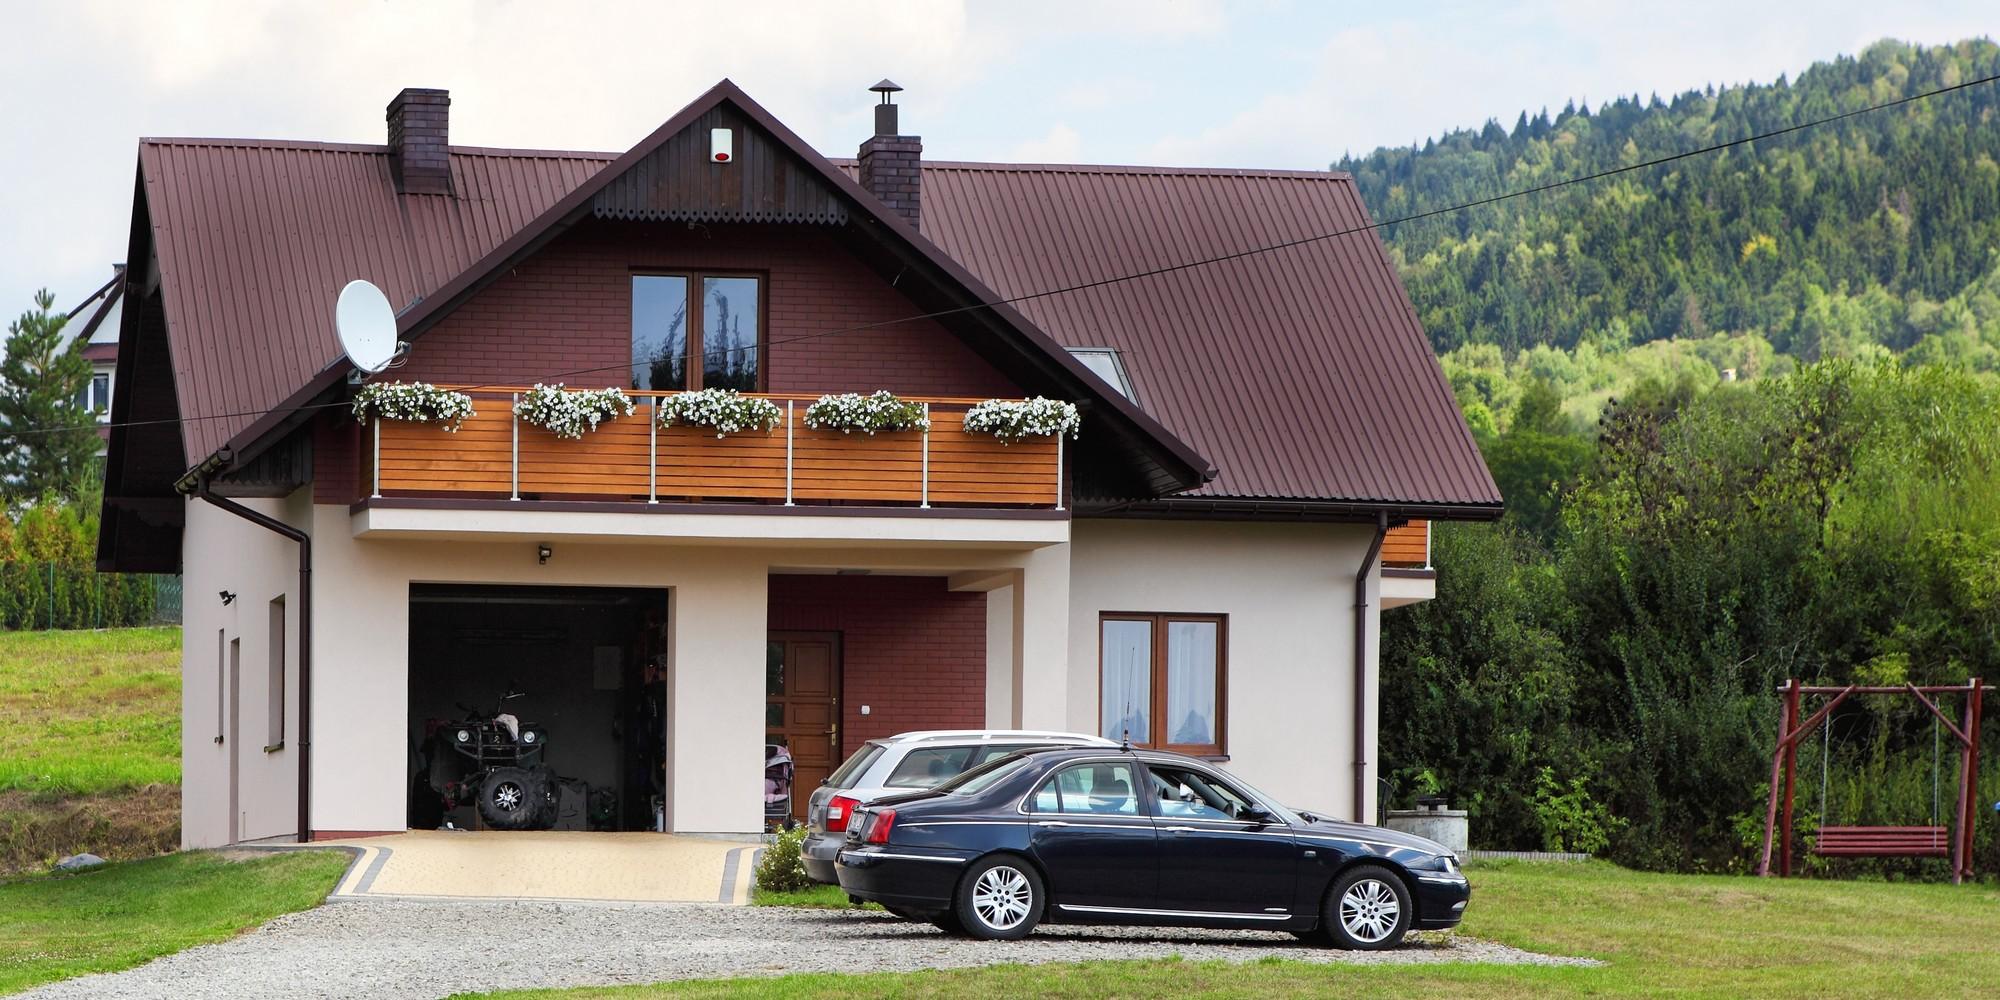 auto-home-insurance